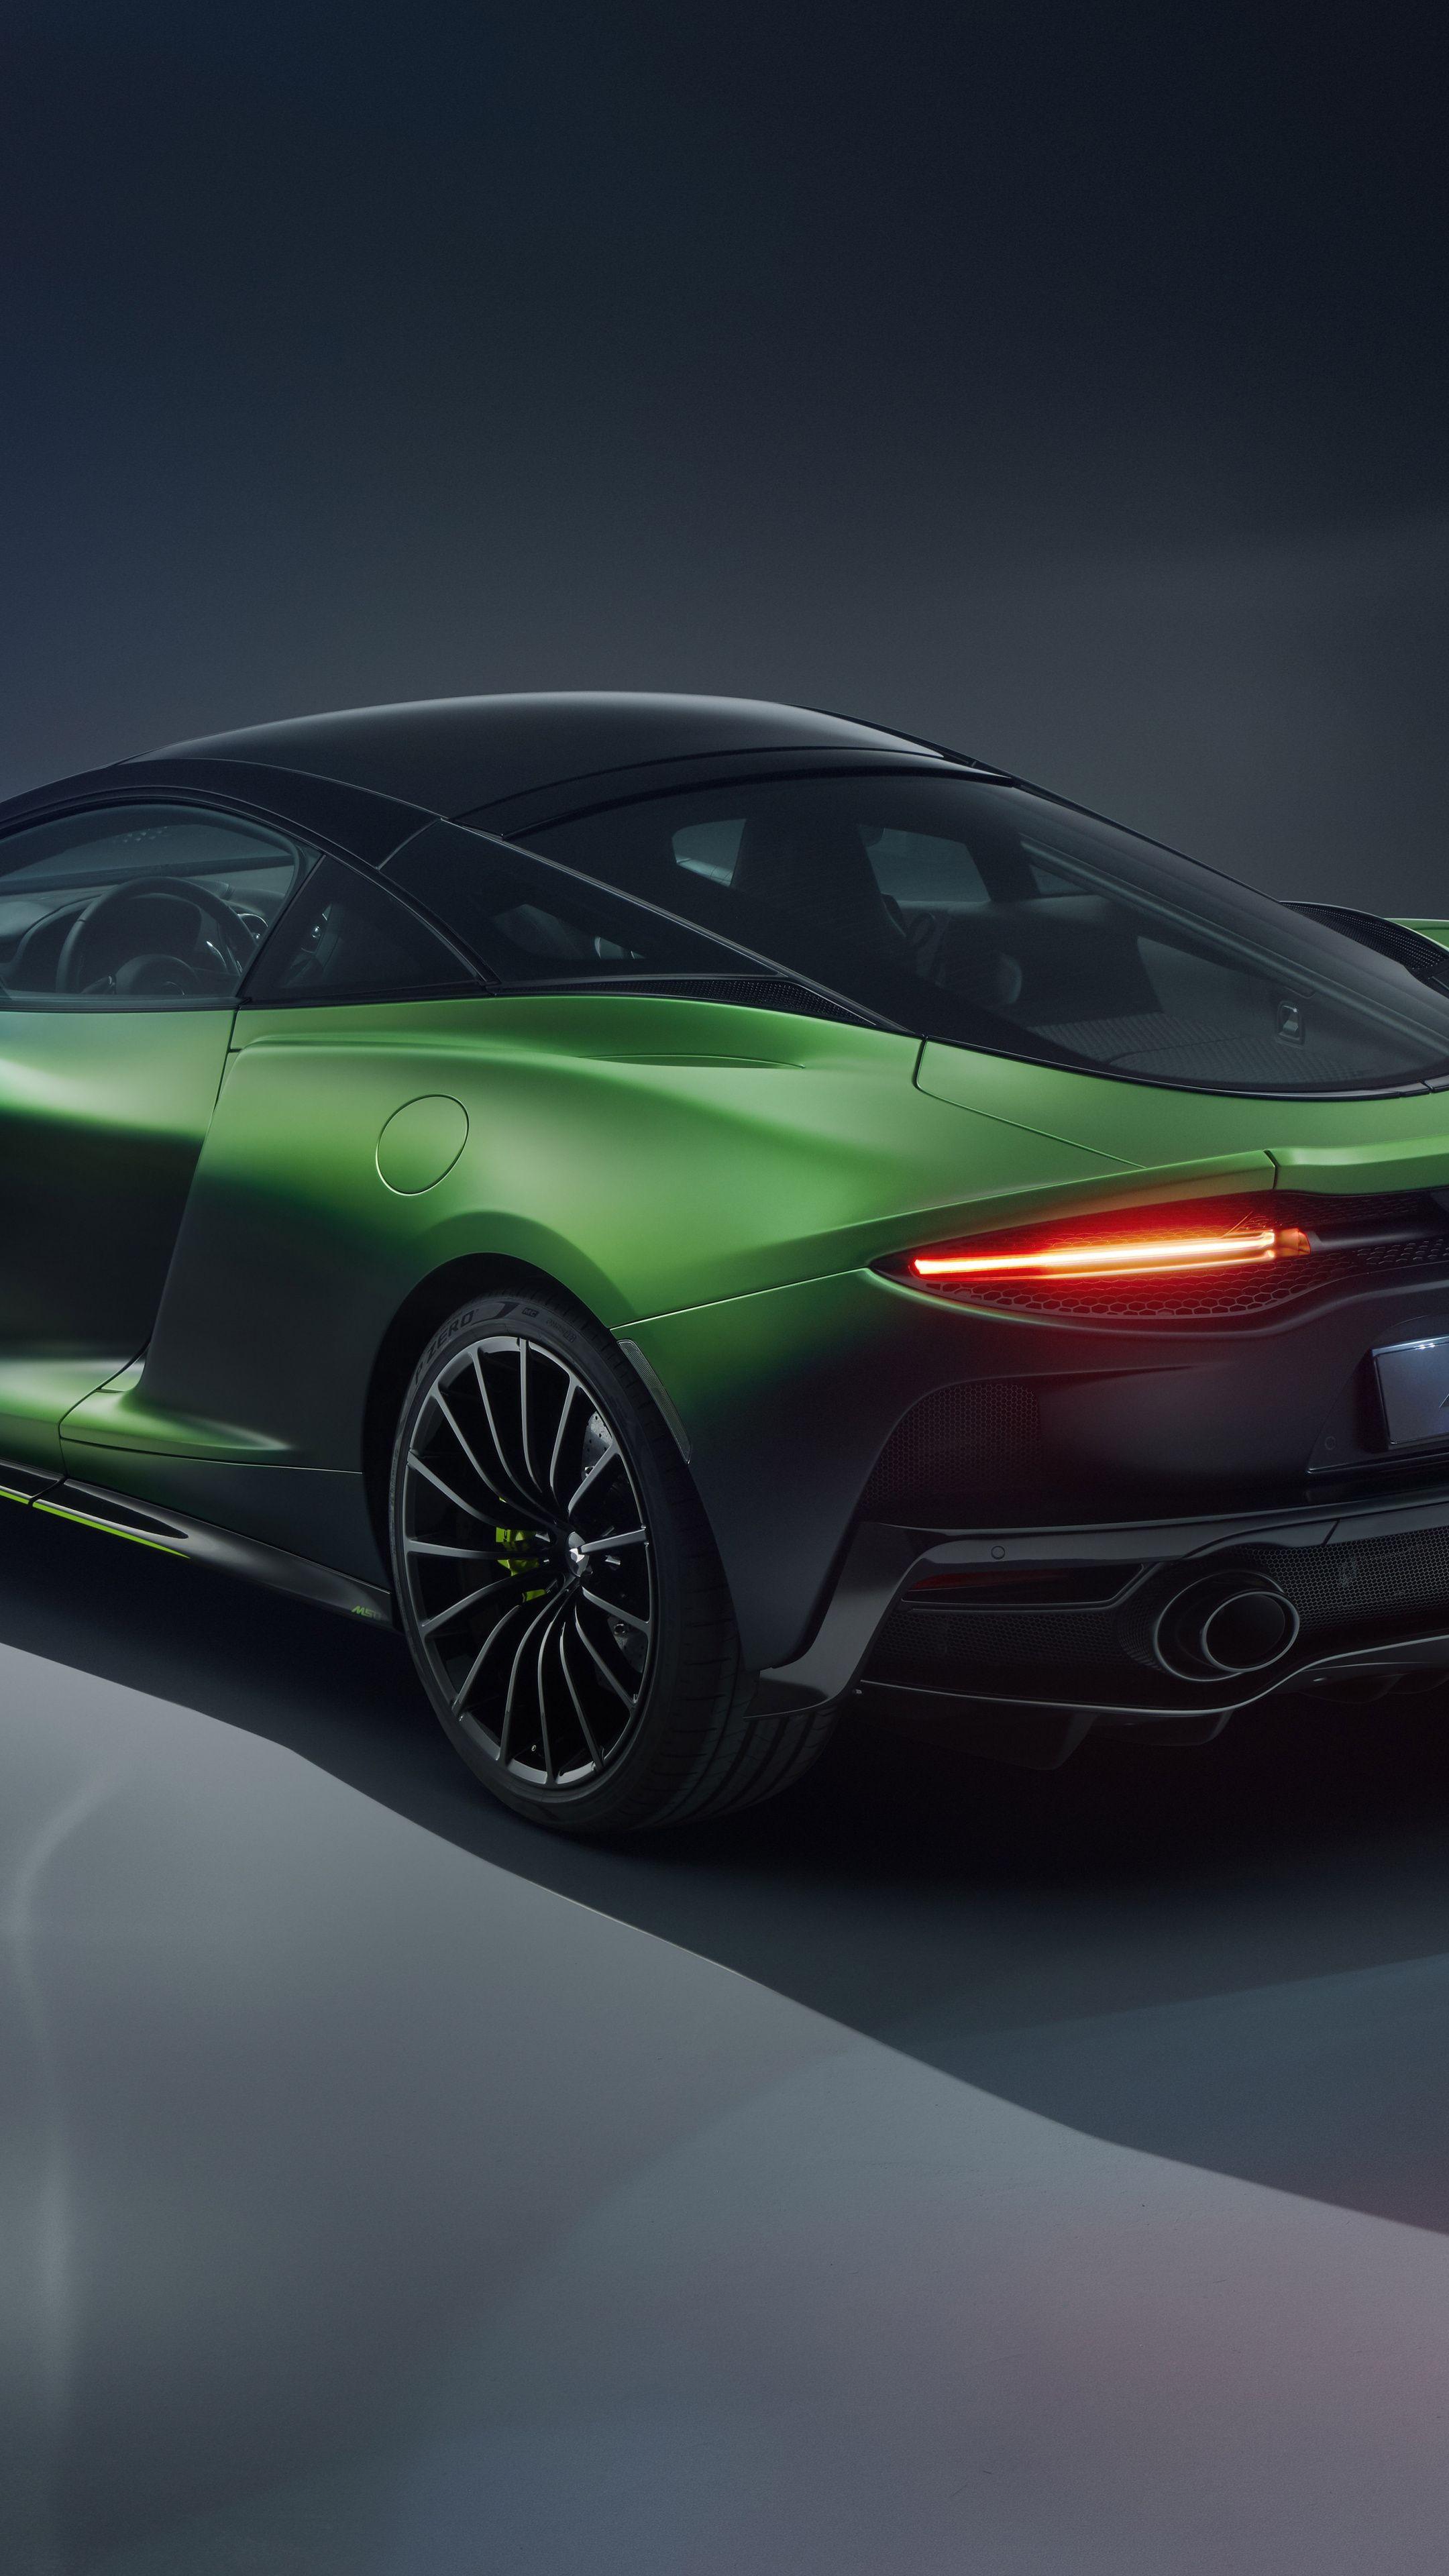 Download Car Green Mclaren Wallpaper For Screen 2160x3840 4k